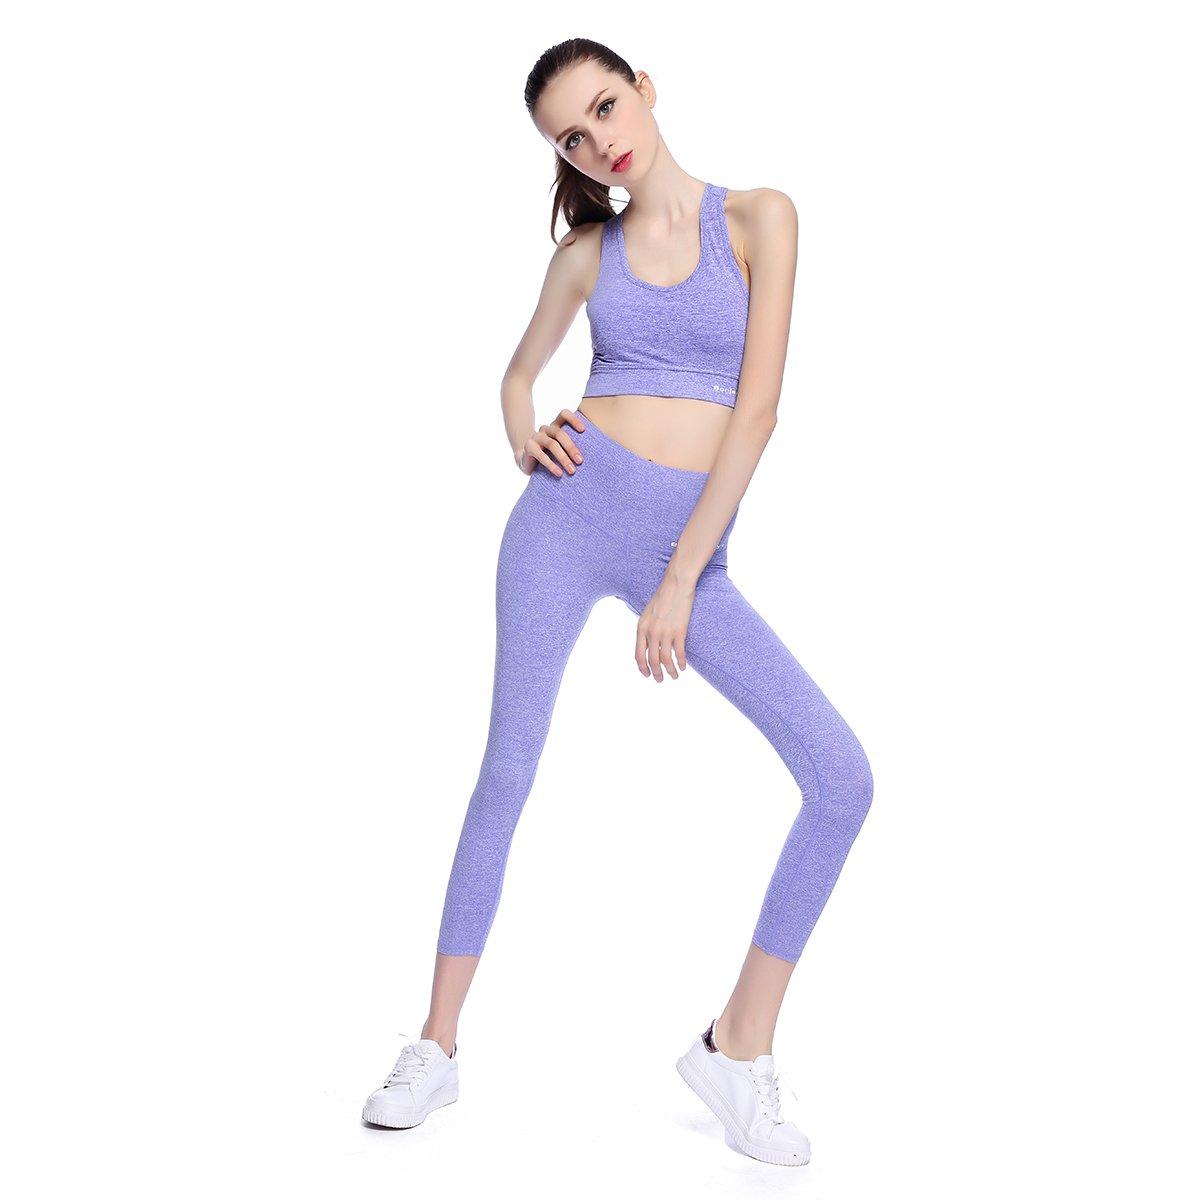 Bonjanvye Yoga Clothes for Women Set Activewear Jacket with ...